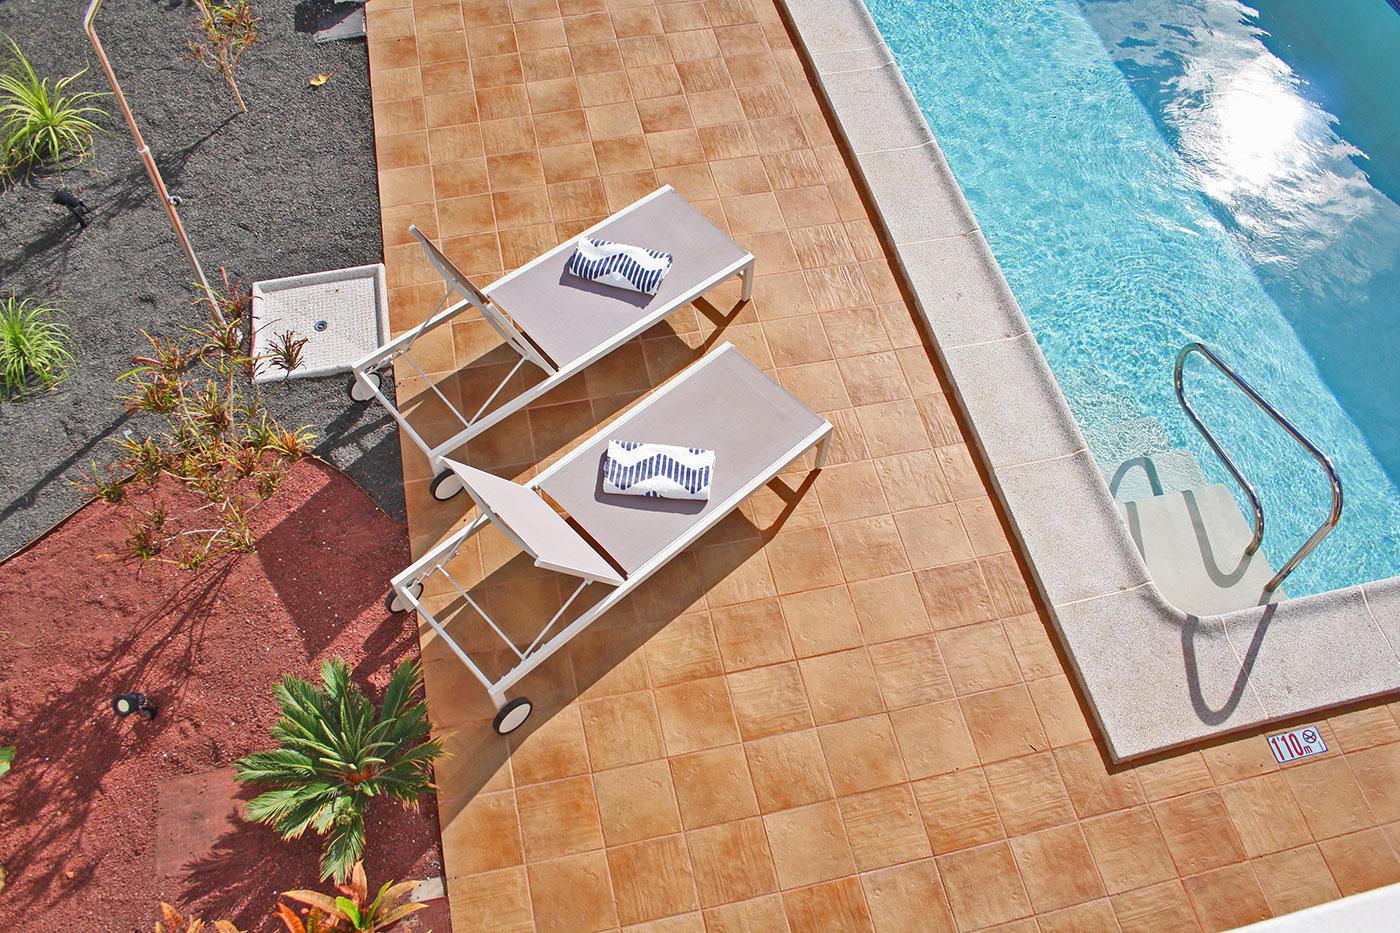 villa_sloop_luxury_villa_with_pool